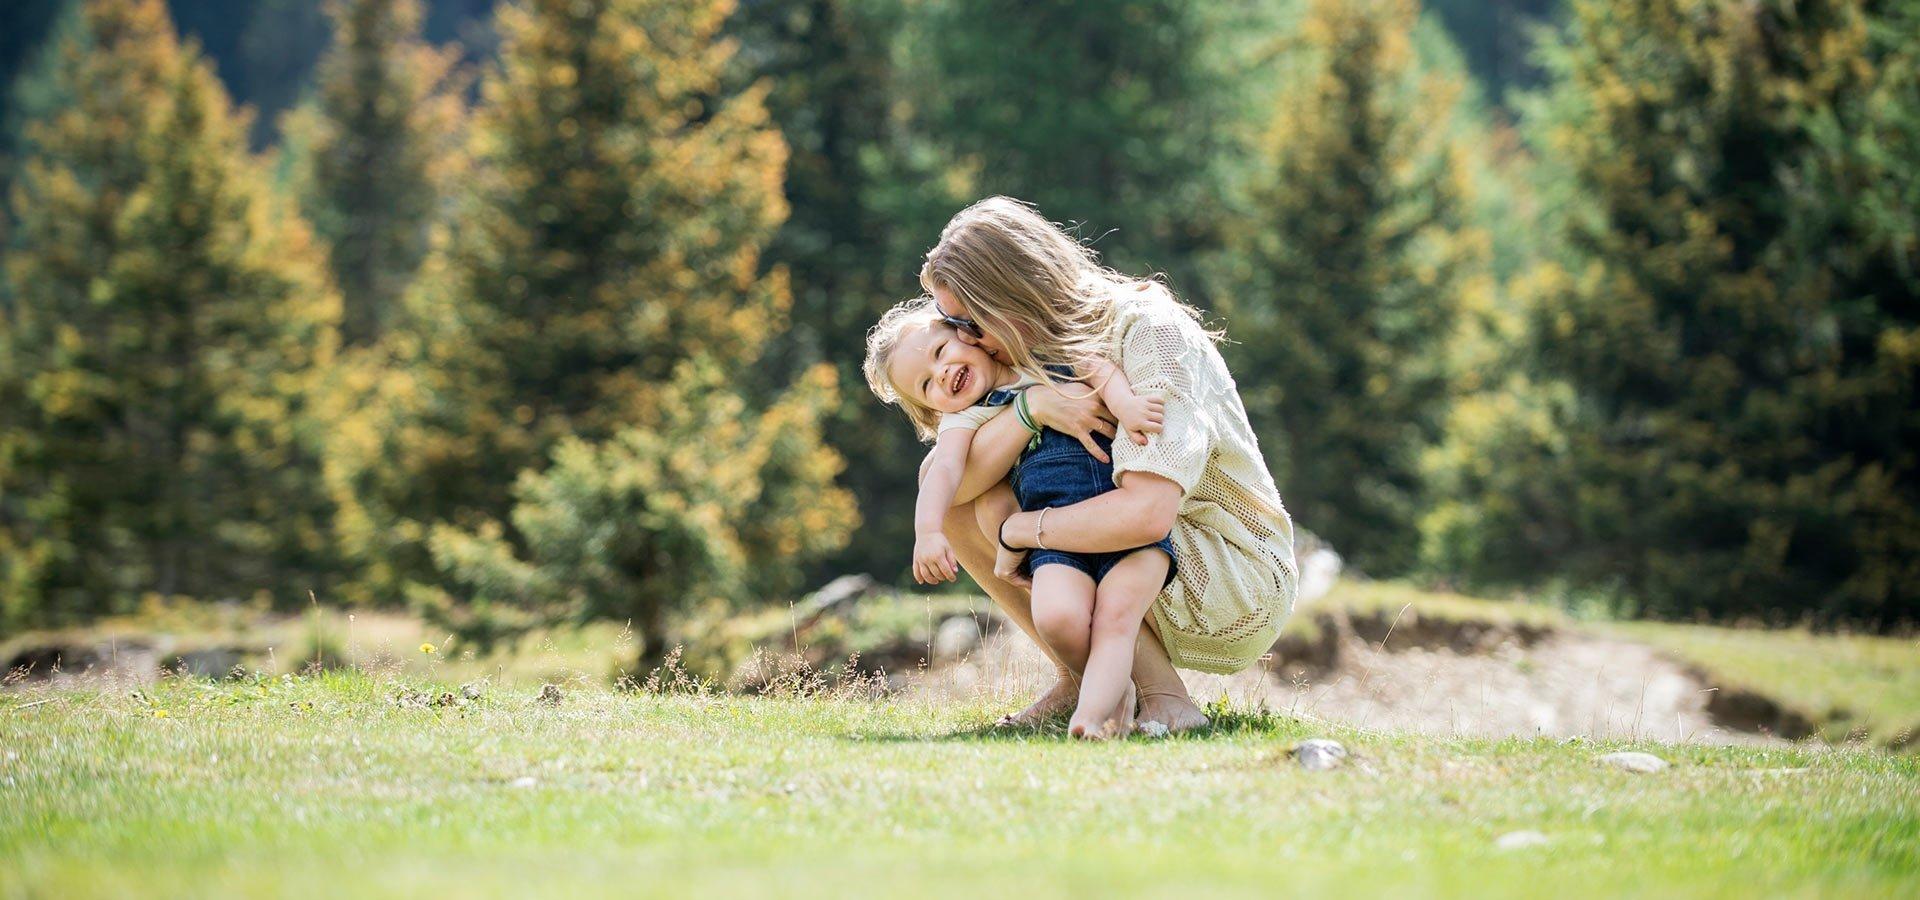 Roner Alm | Family bargain mountain week in fall